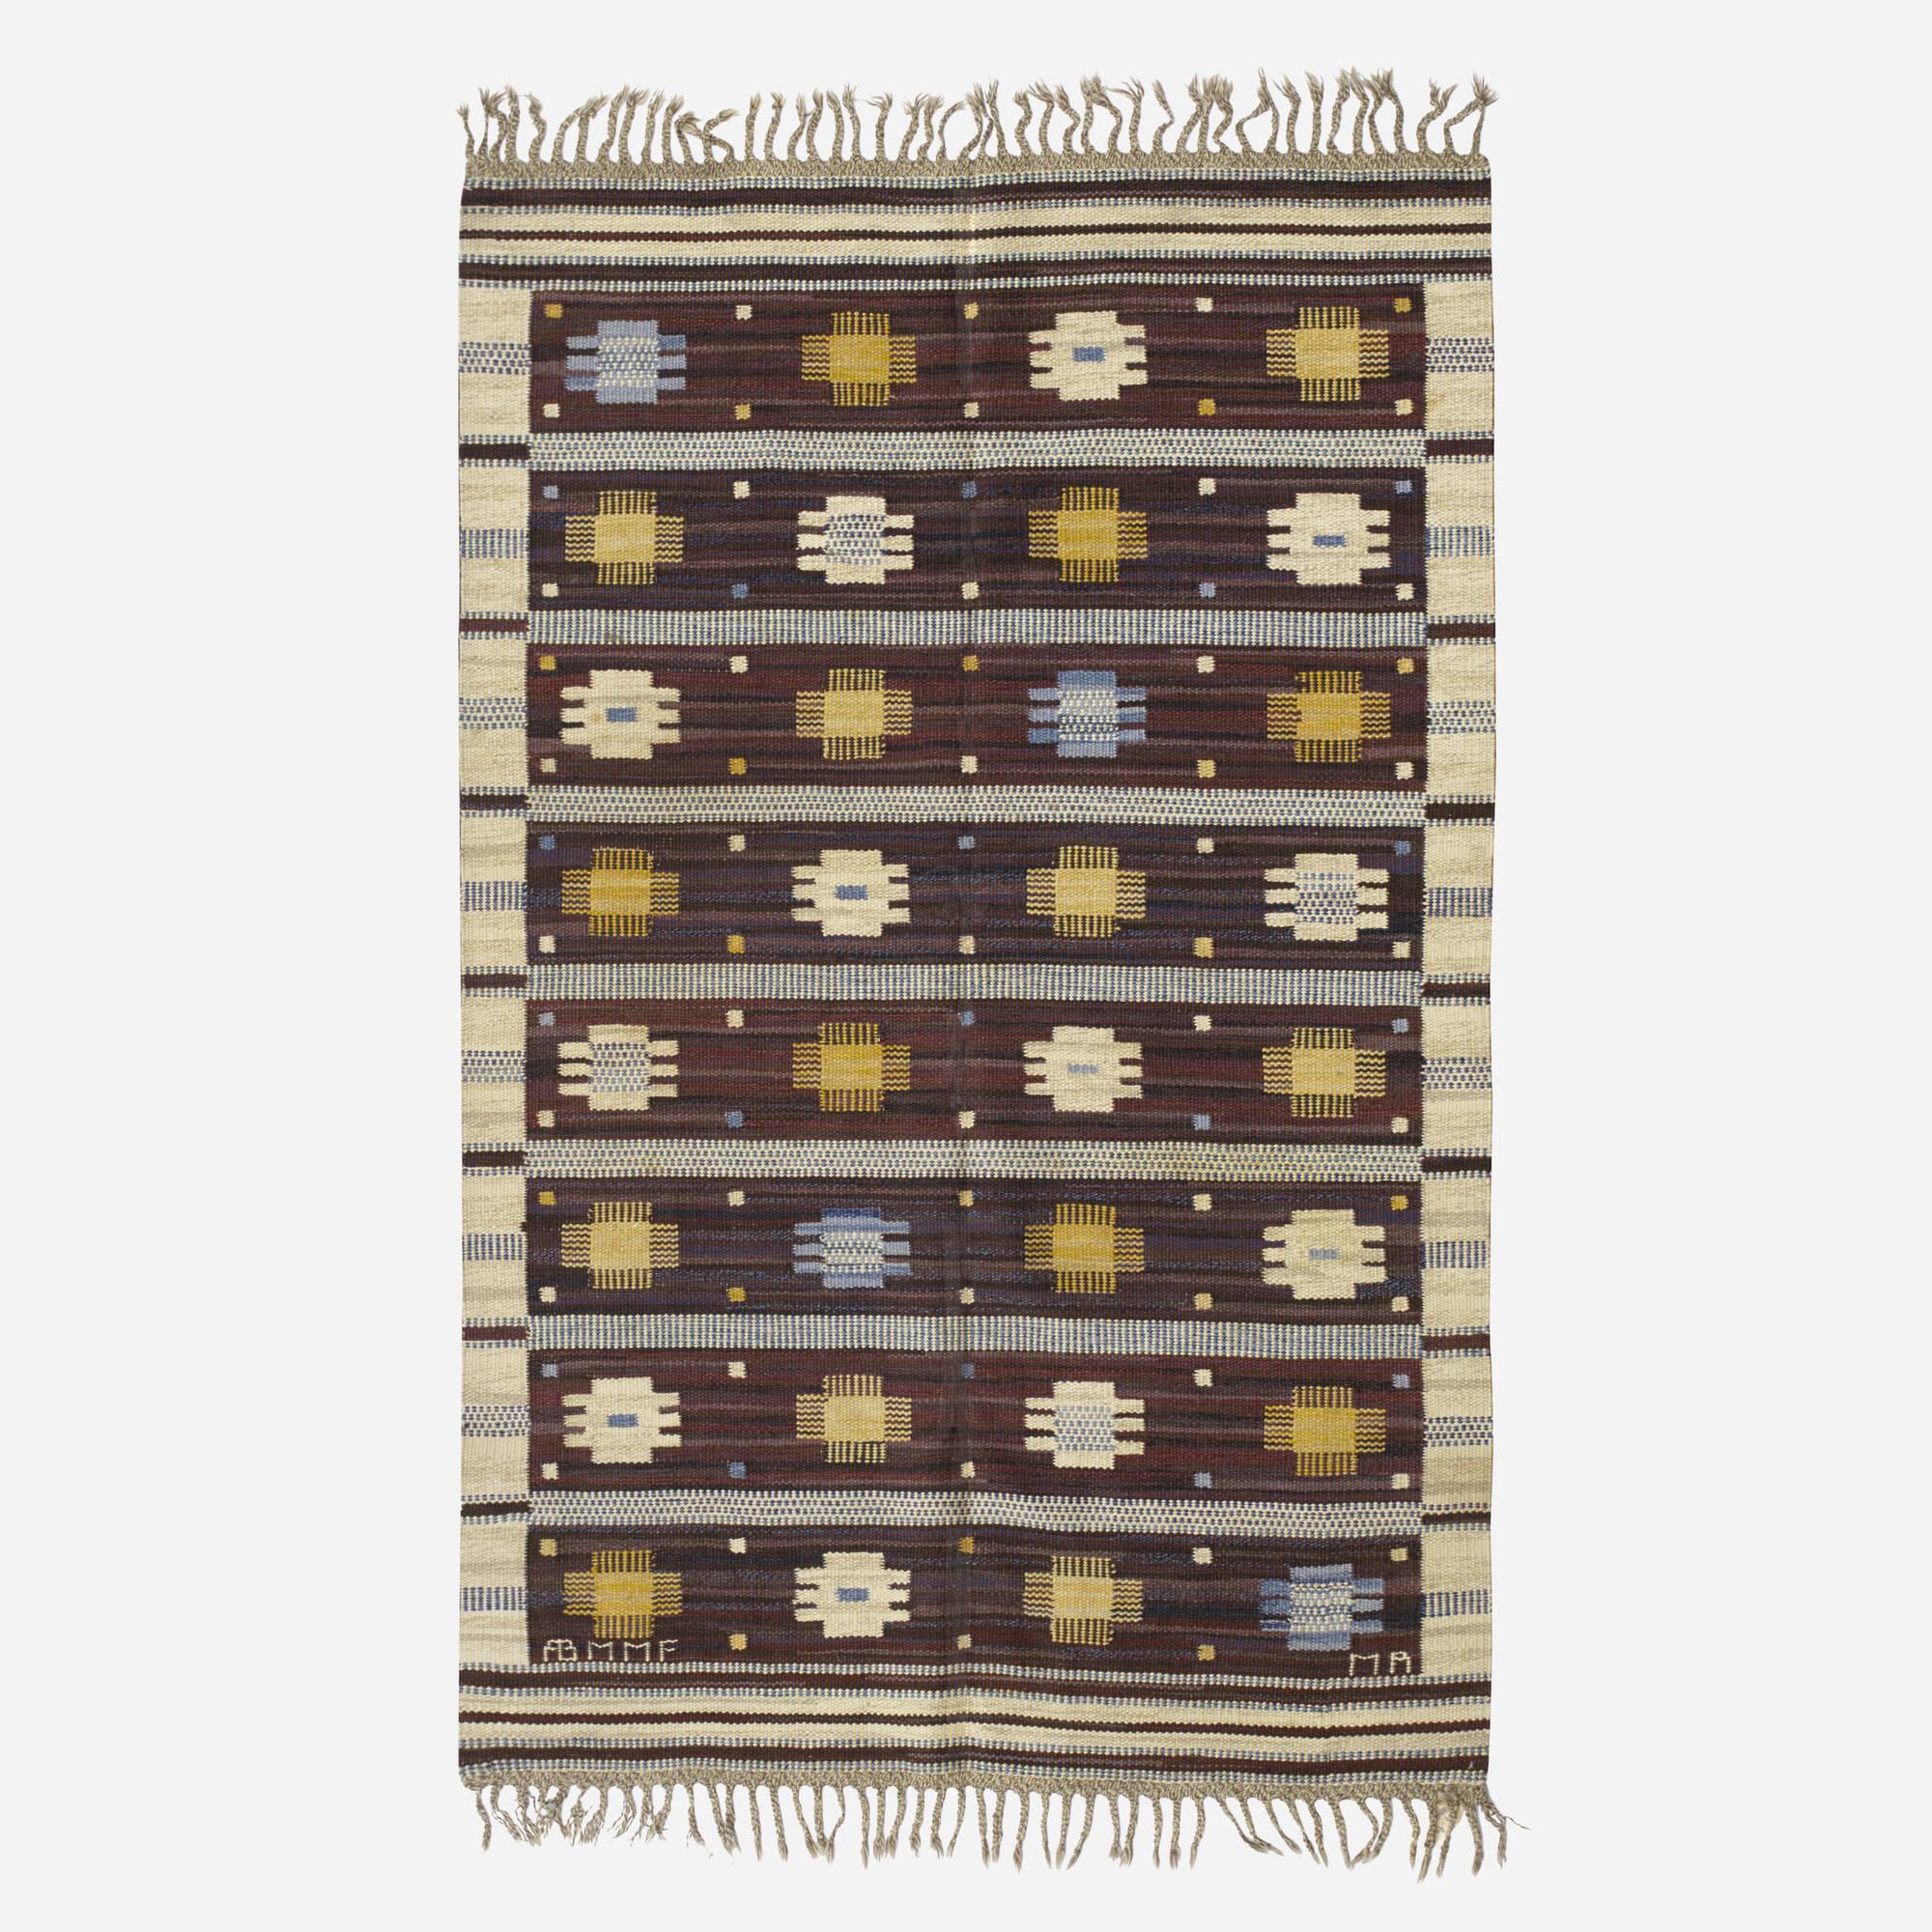 205: Marianne Richter / Hästhov flatweave carpet (1 of 1)